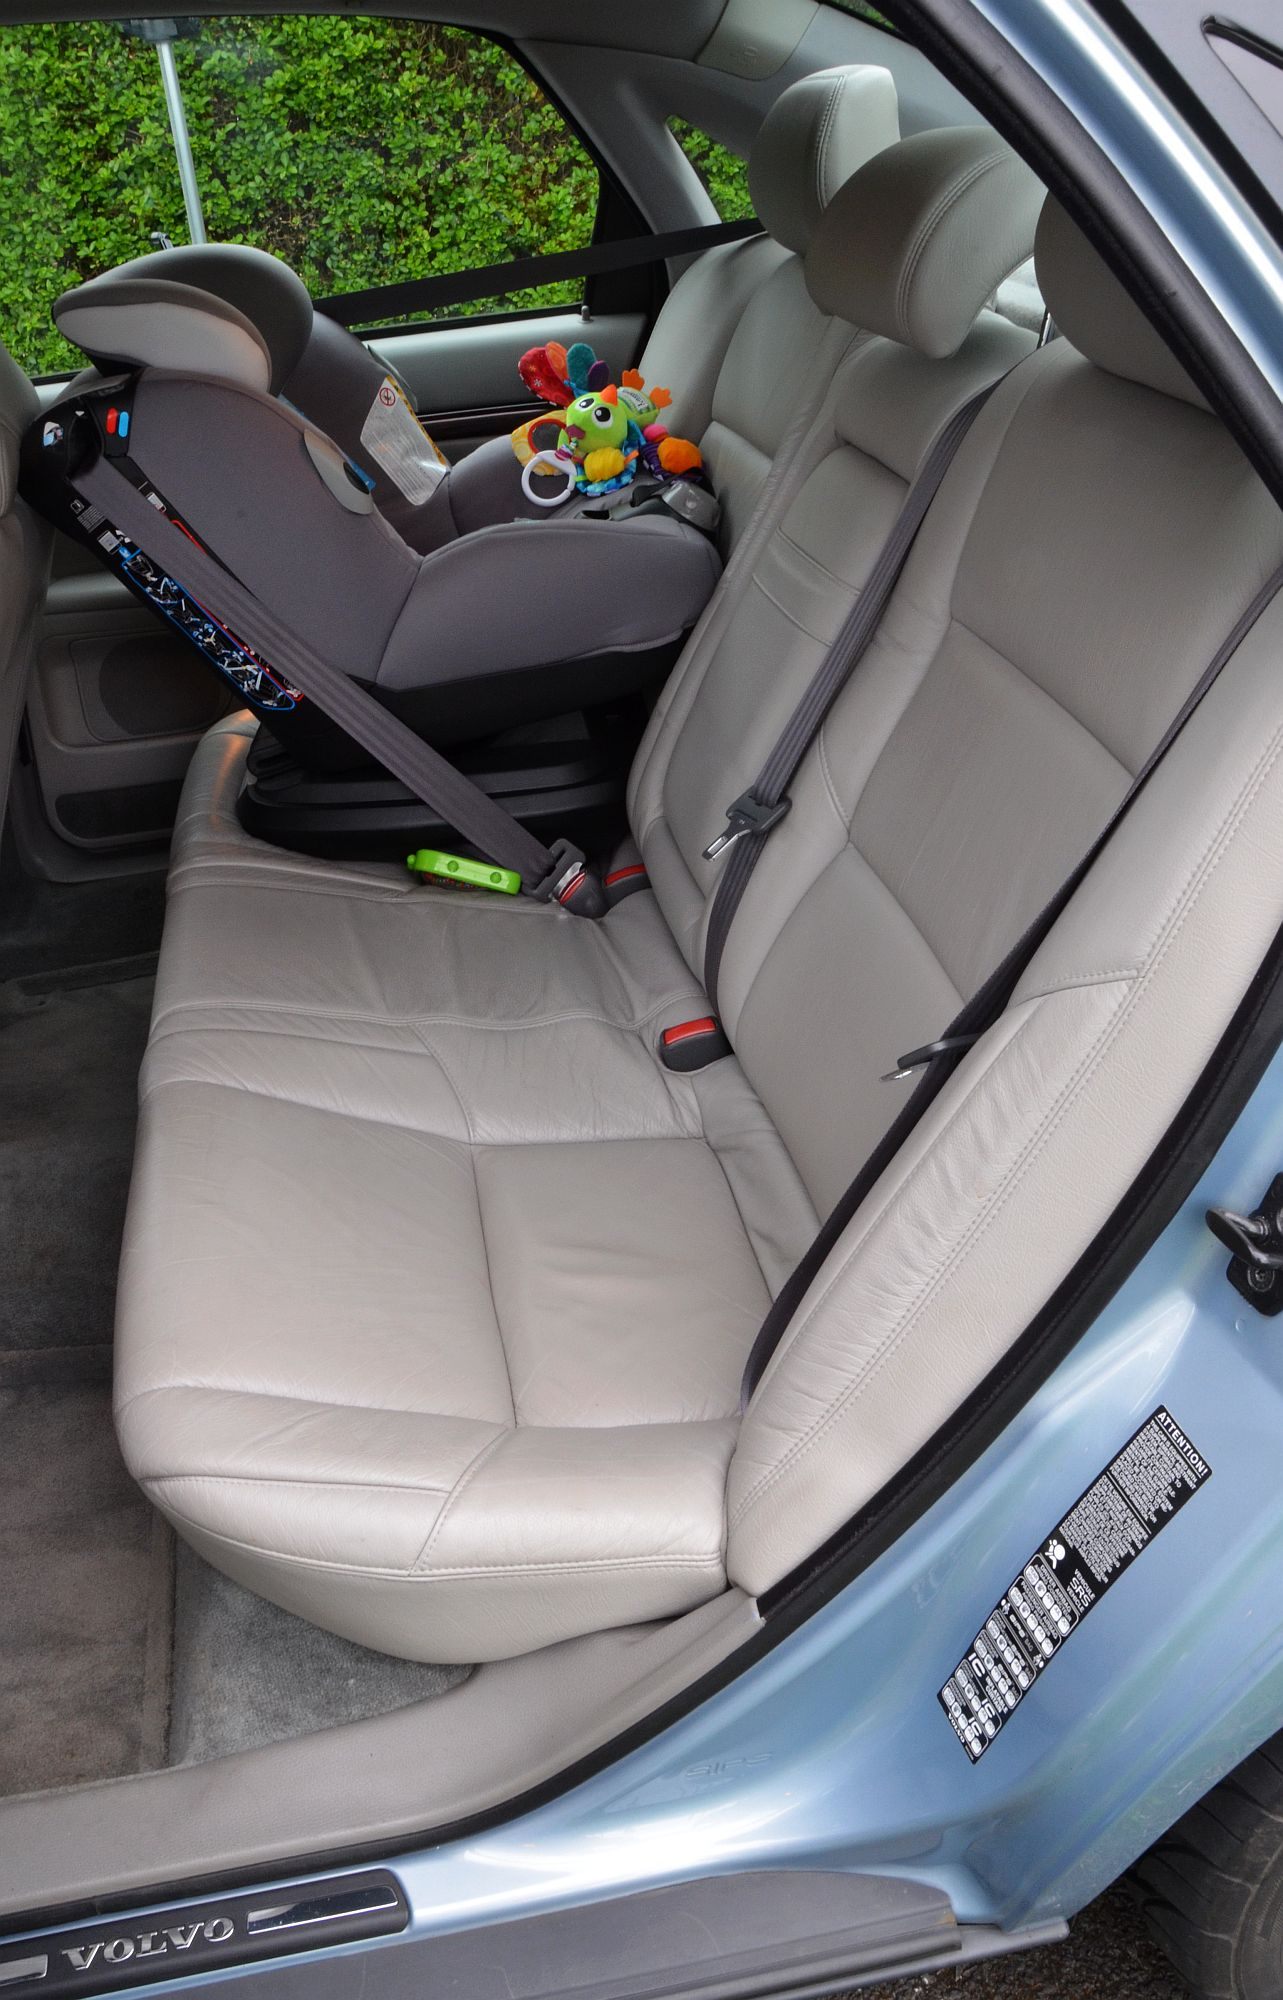 File:Volvo S80 2.4T 2002 Blue, interior rear..jpg - Wikimedia Commons